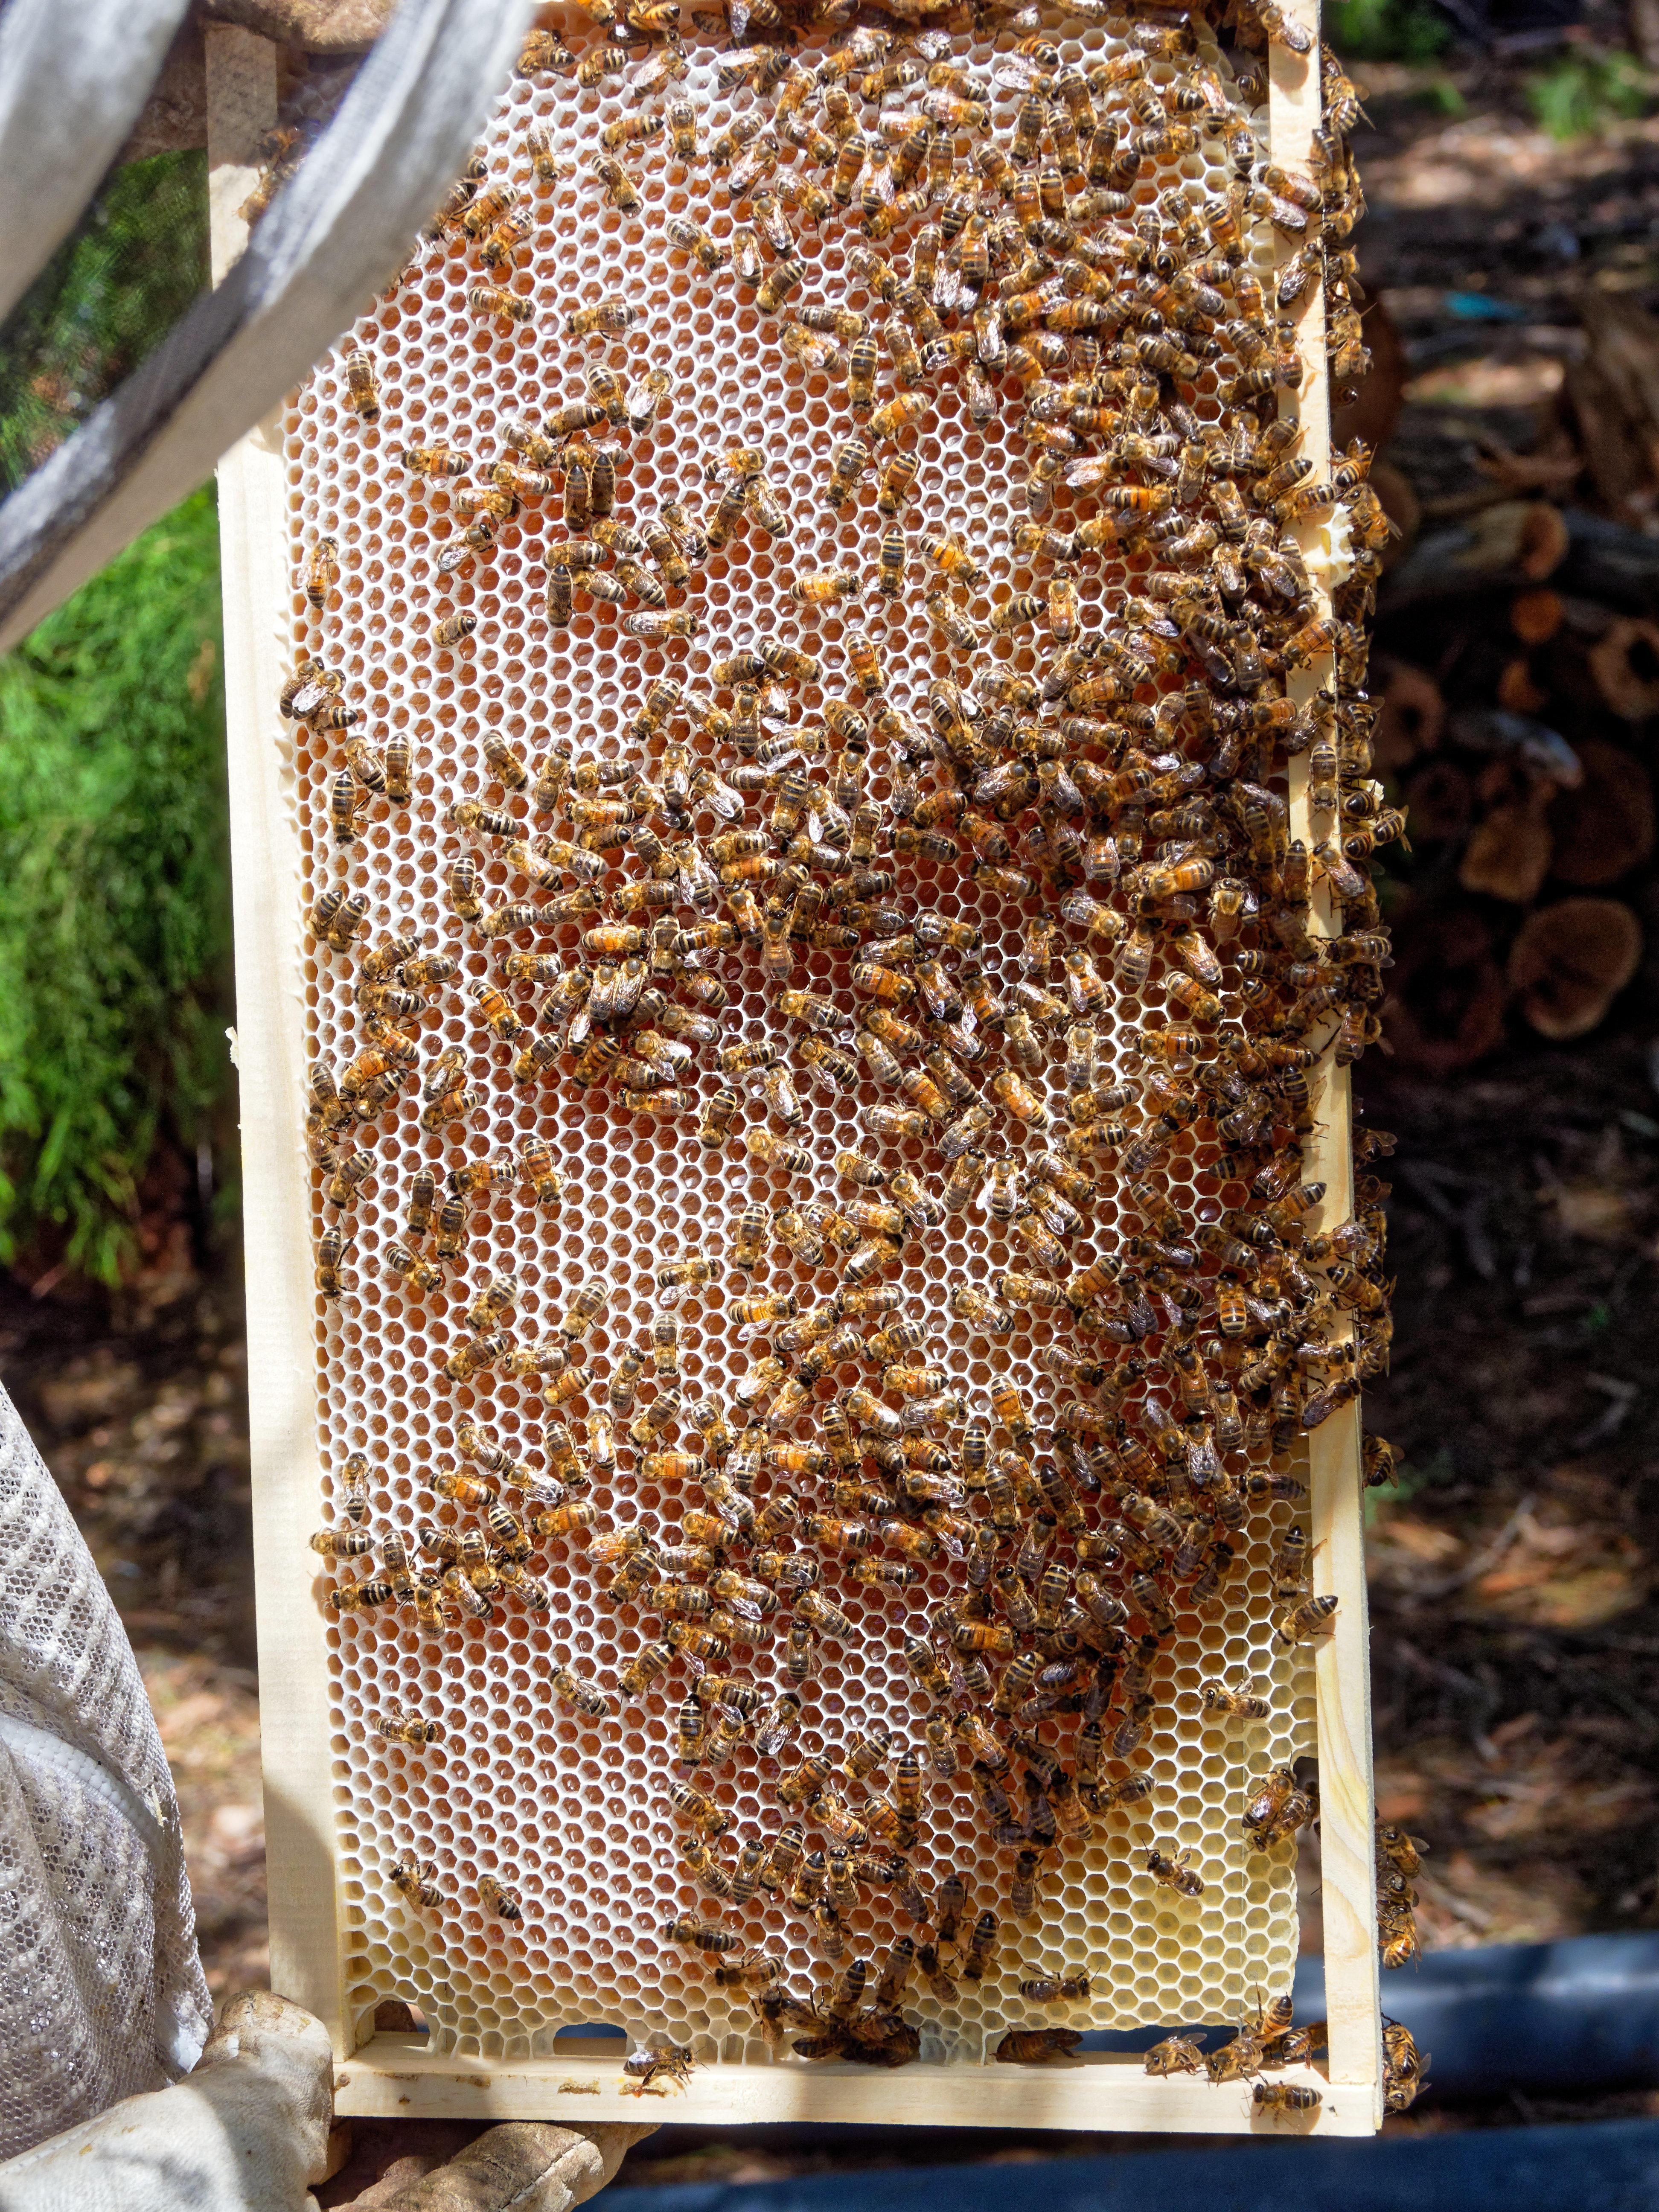 Inspecting-beehives-33.jpeg